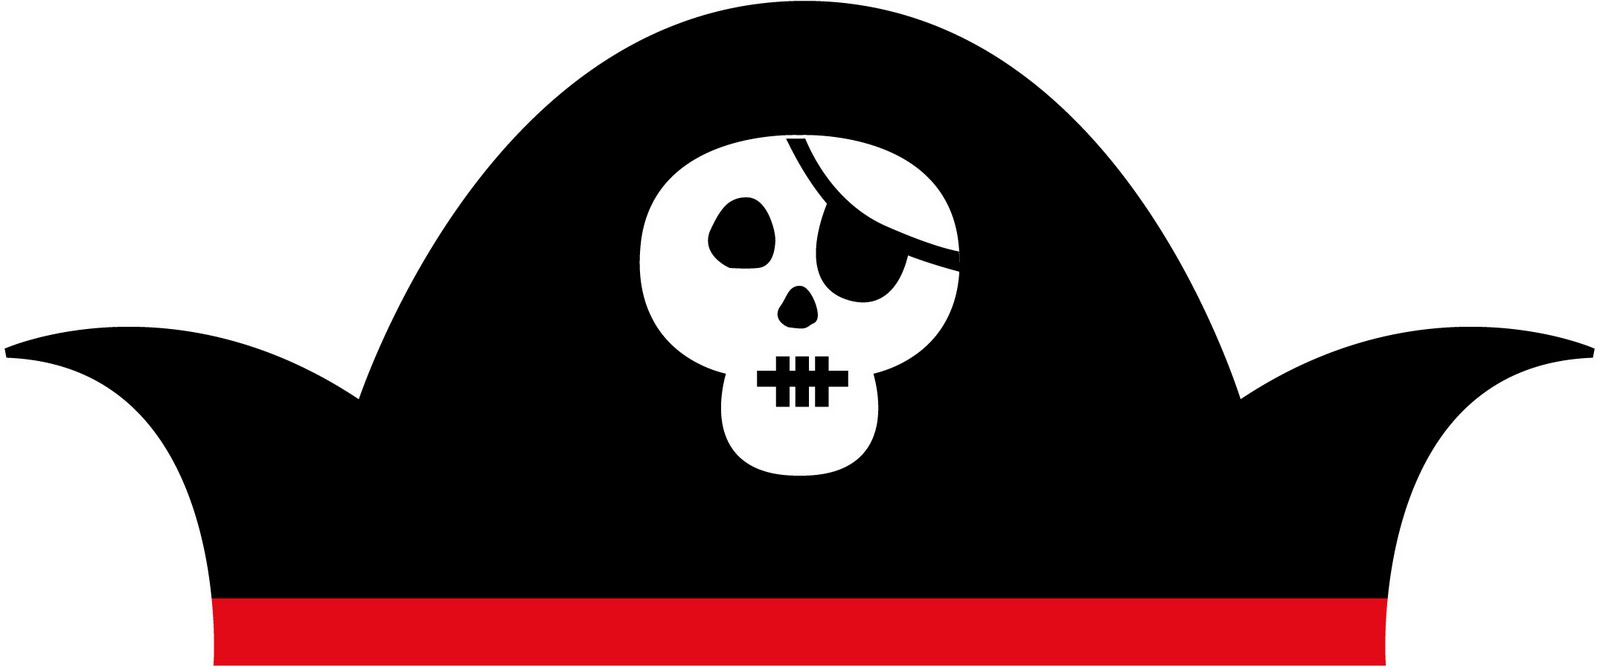 Pirate Hat Clipart Clipart Best-Pirate Hat Clipart Clipart Best-16